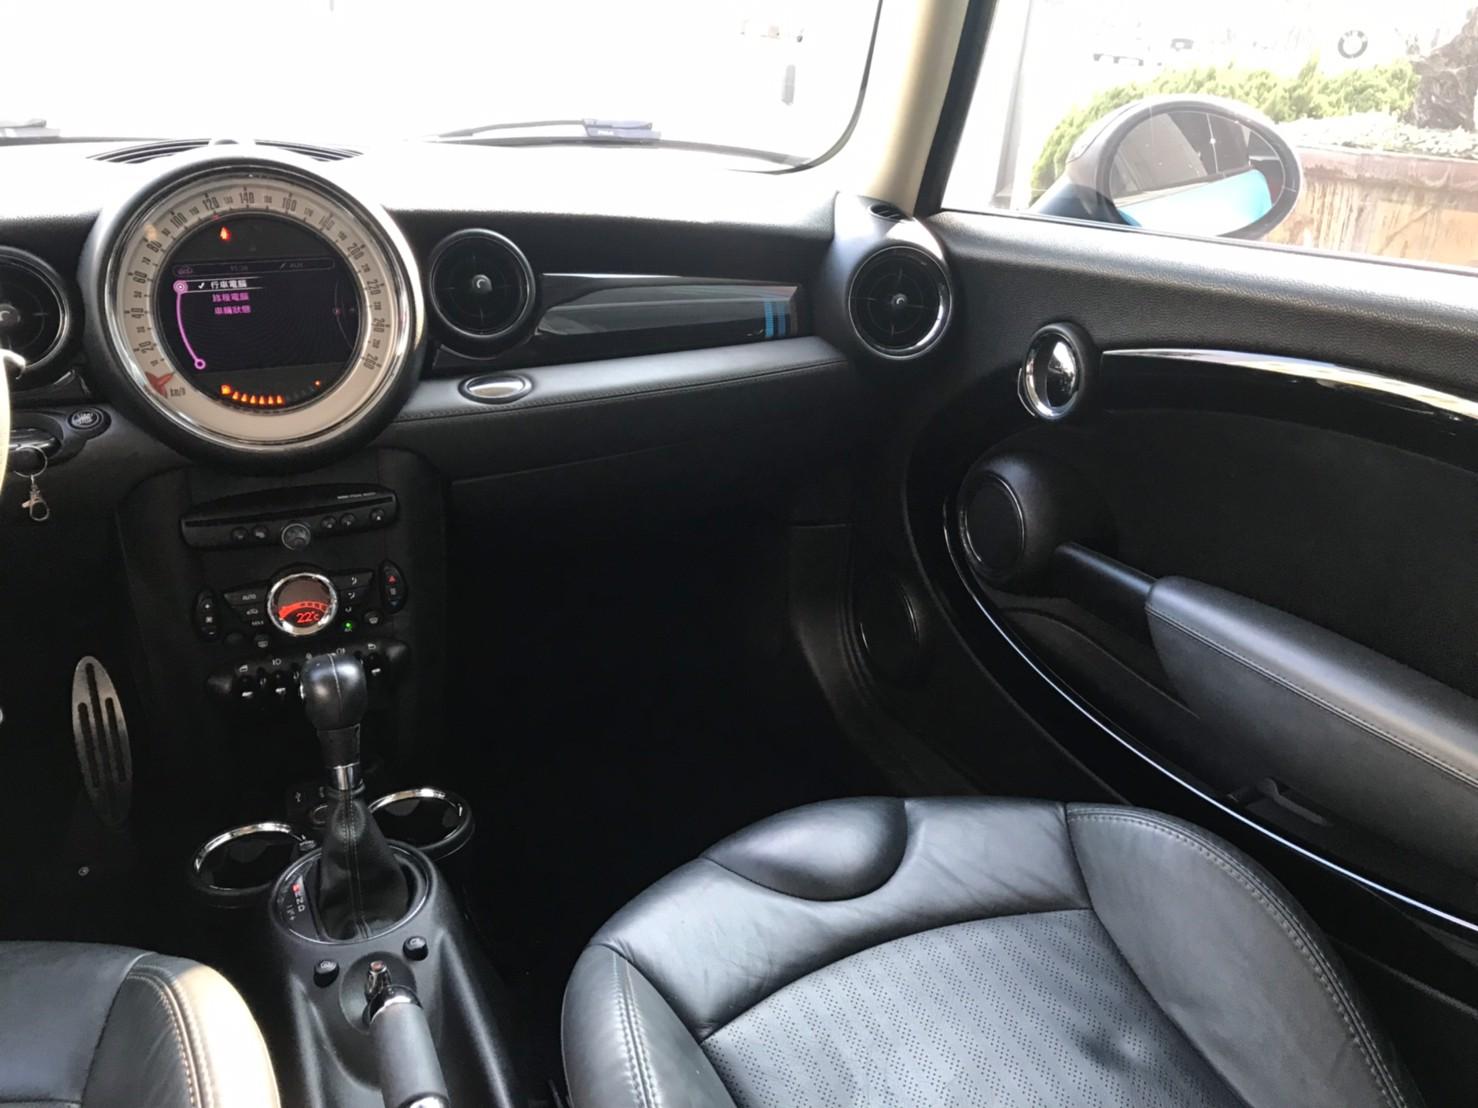 LINE_ALBUM_20129 特仕版COOPER S。17吋鋁圈。雙排氣尾管 保證一手女用車  夢想玩具車 59.9_210919_7